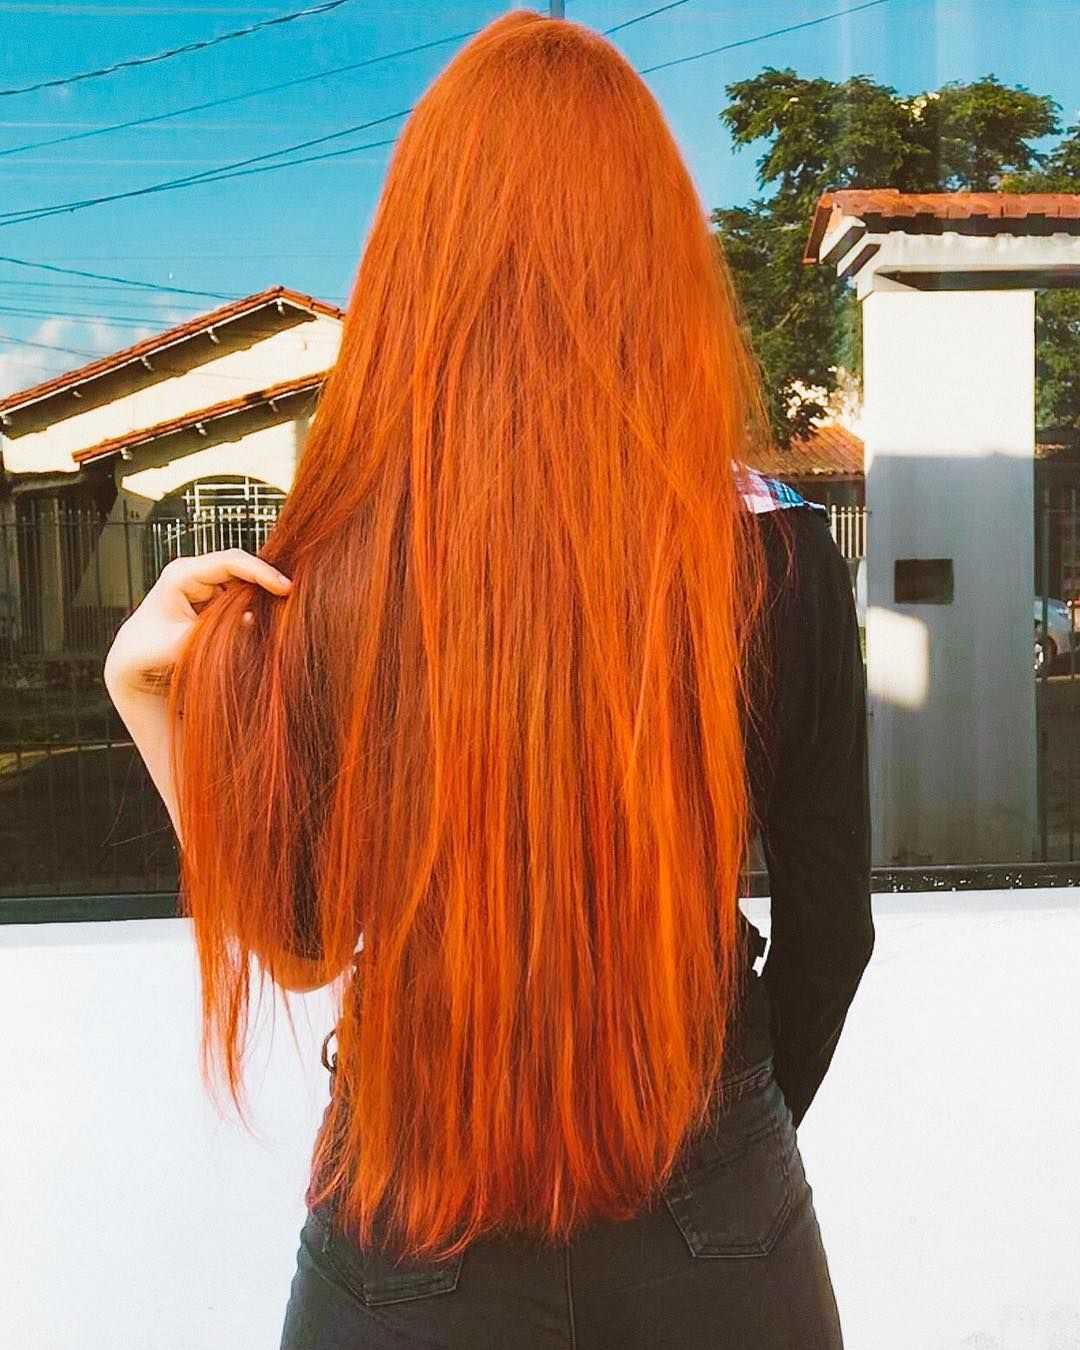 Pin by dara hellman on hair inspo pinterest hair coloring hair